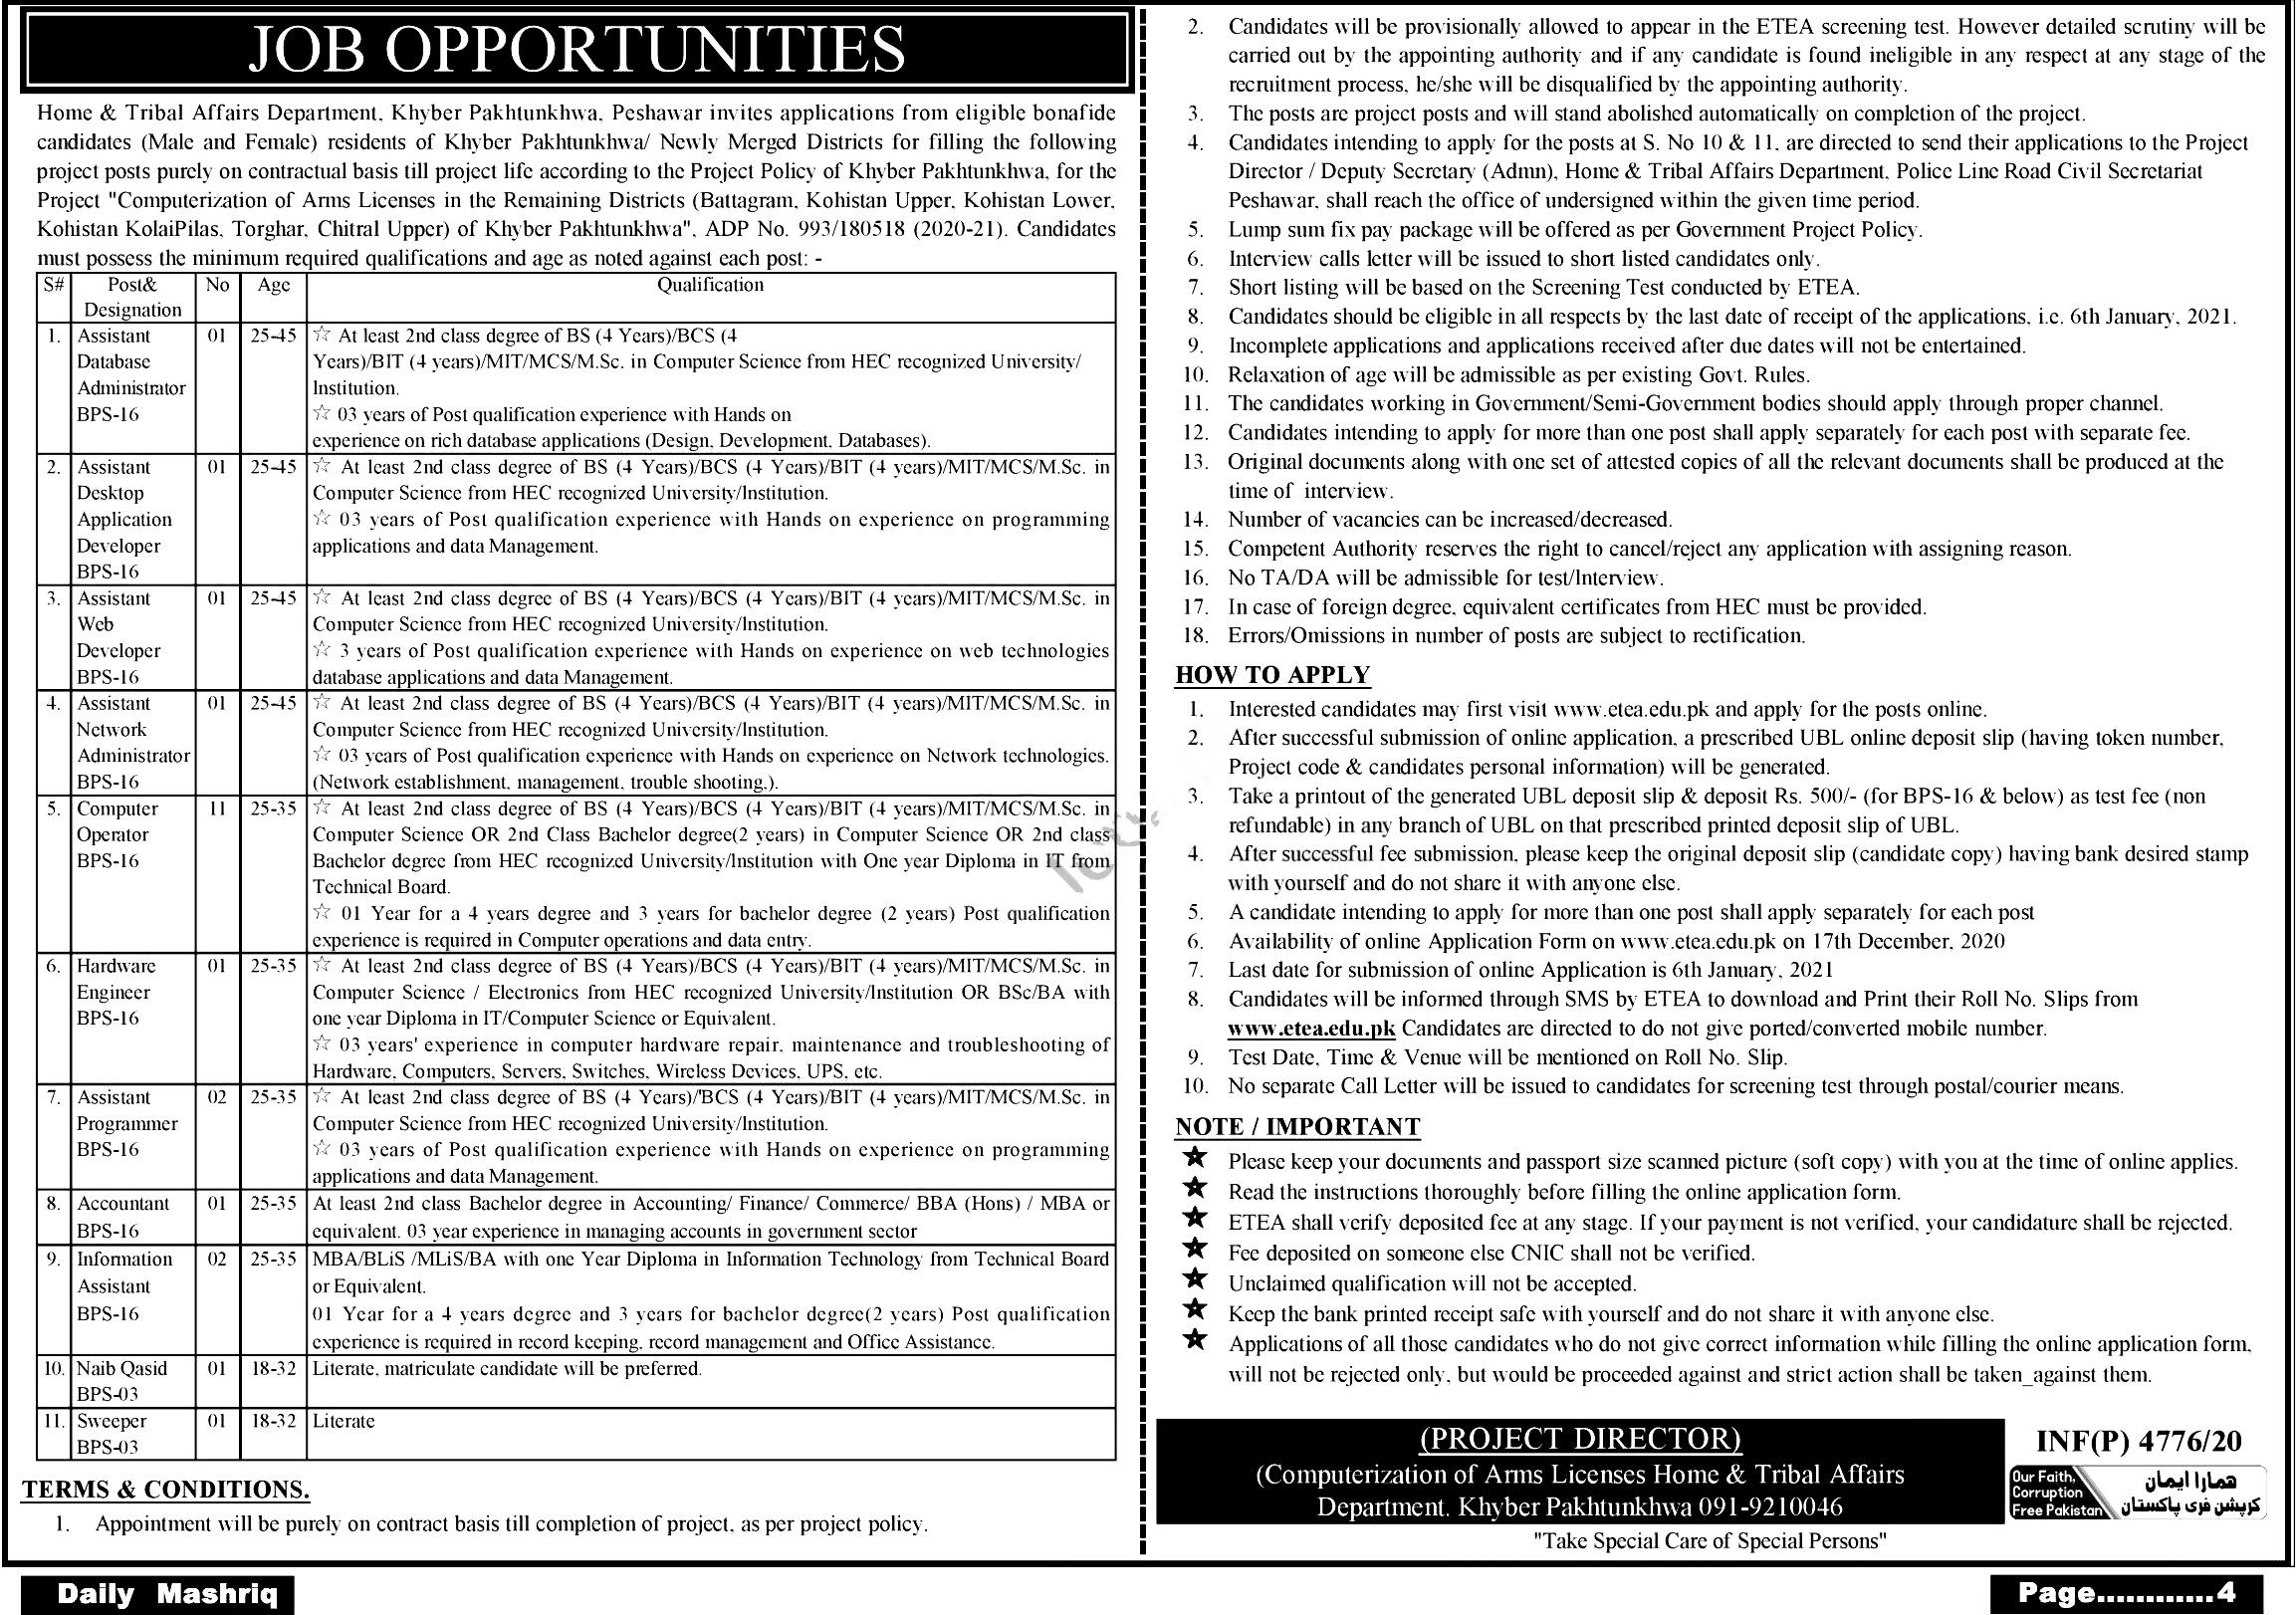 Home & Tribal Affairs KPK ETEA Jobs 2021 Application Form Roll No Slip Download Online